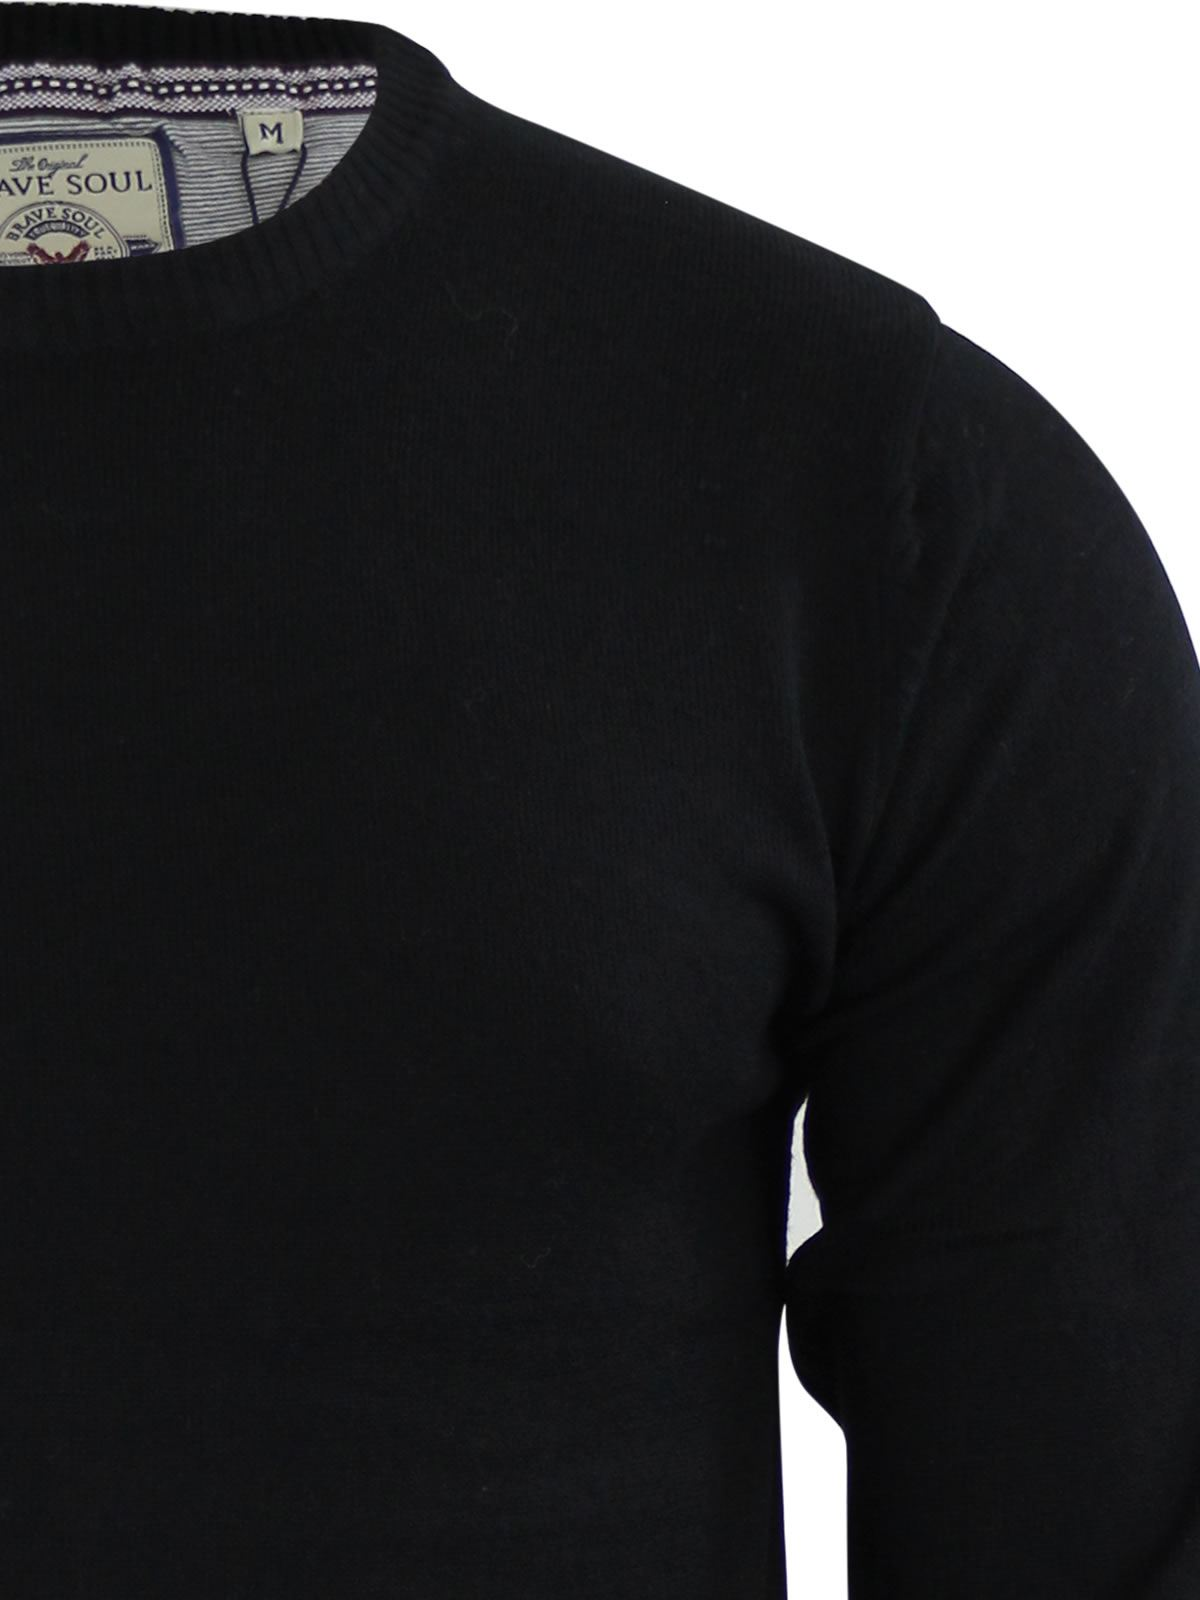 Mens-Jumper-Brave-Soul-Urbain-Knitted-Crew-Neck-Sweater thumbnail 13